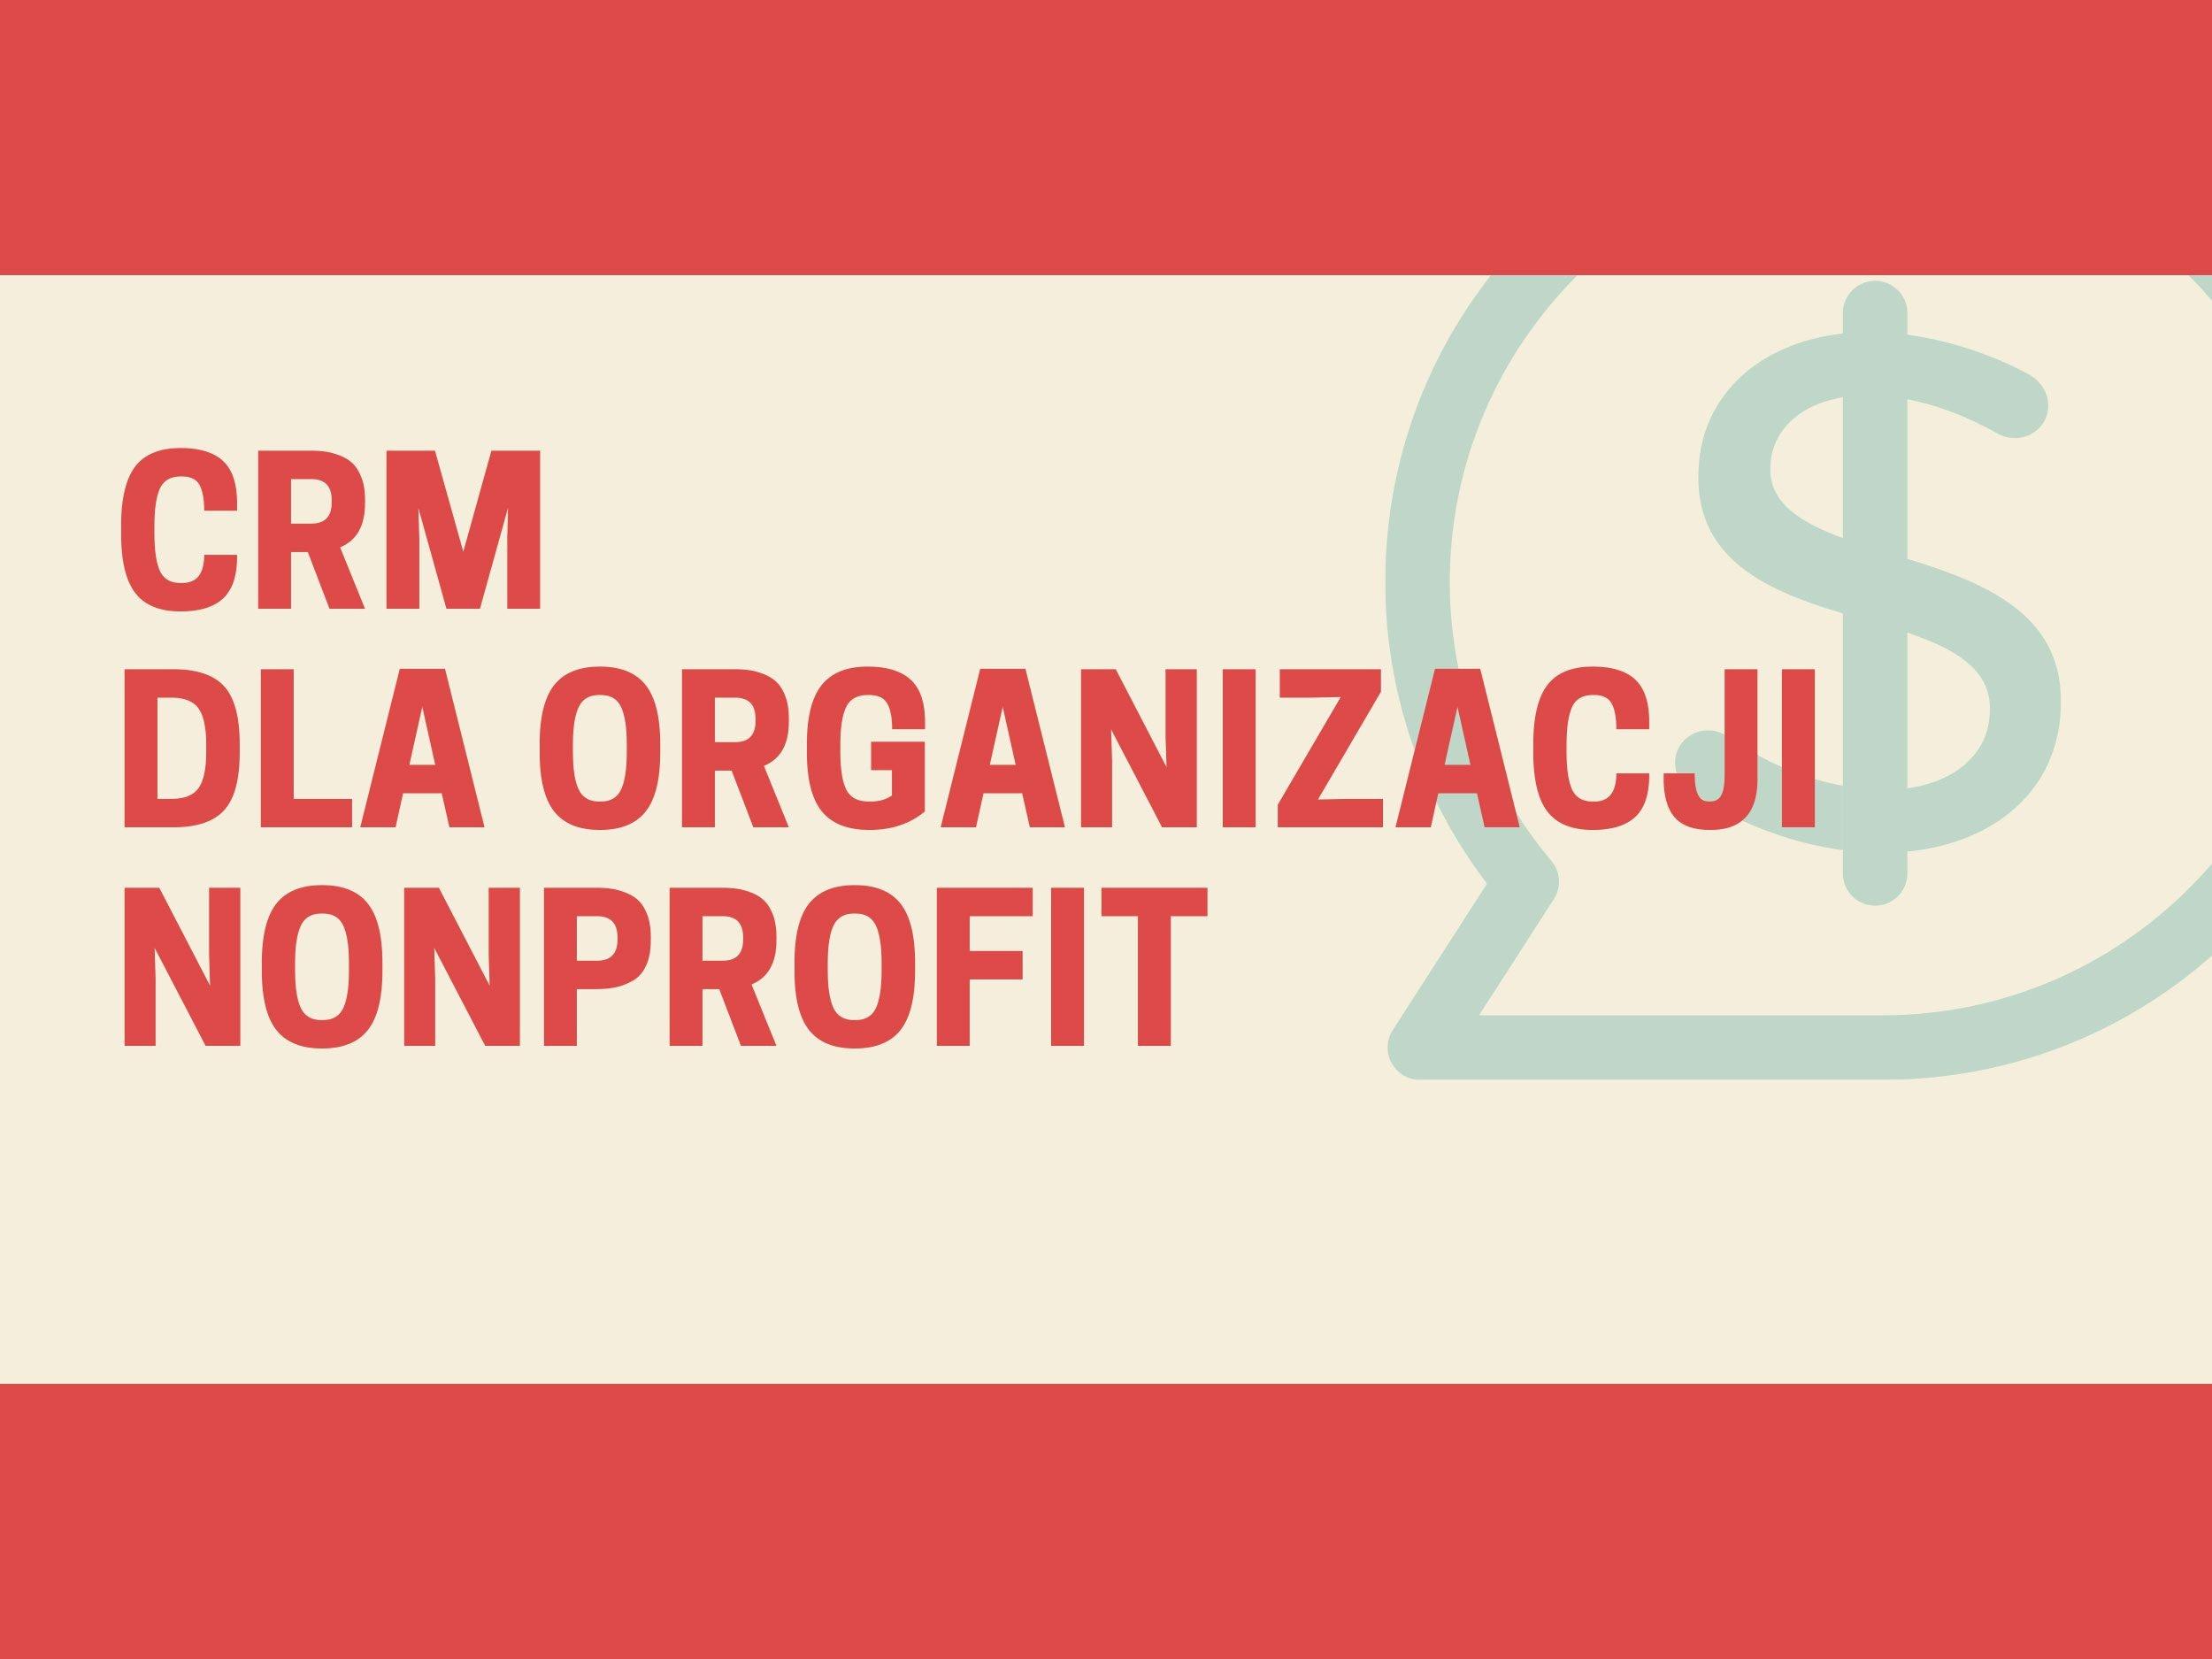 CRM dla organizacji non-profit